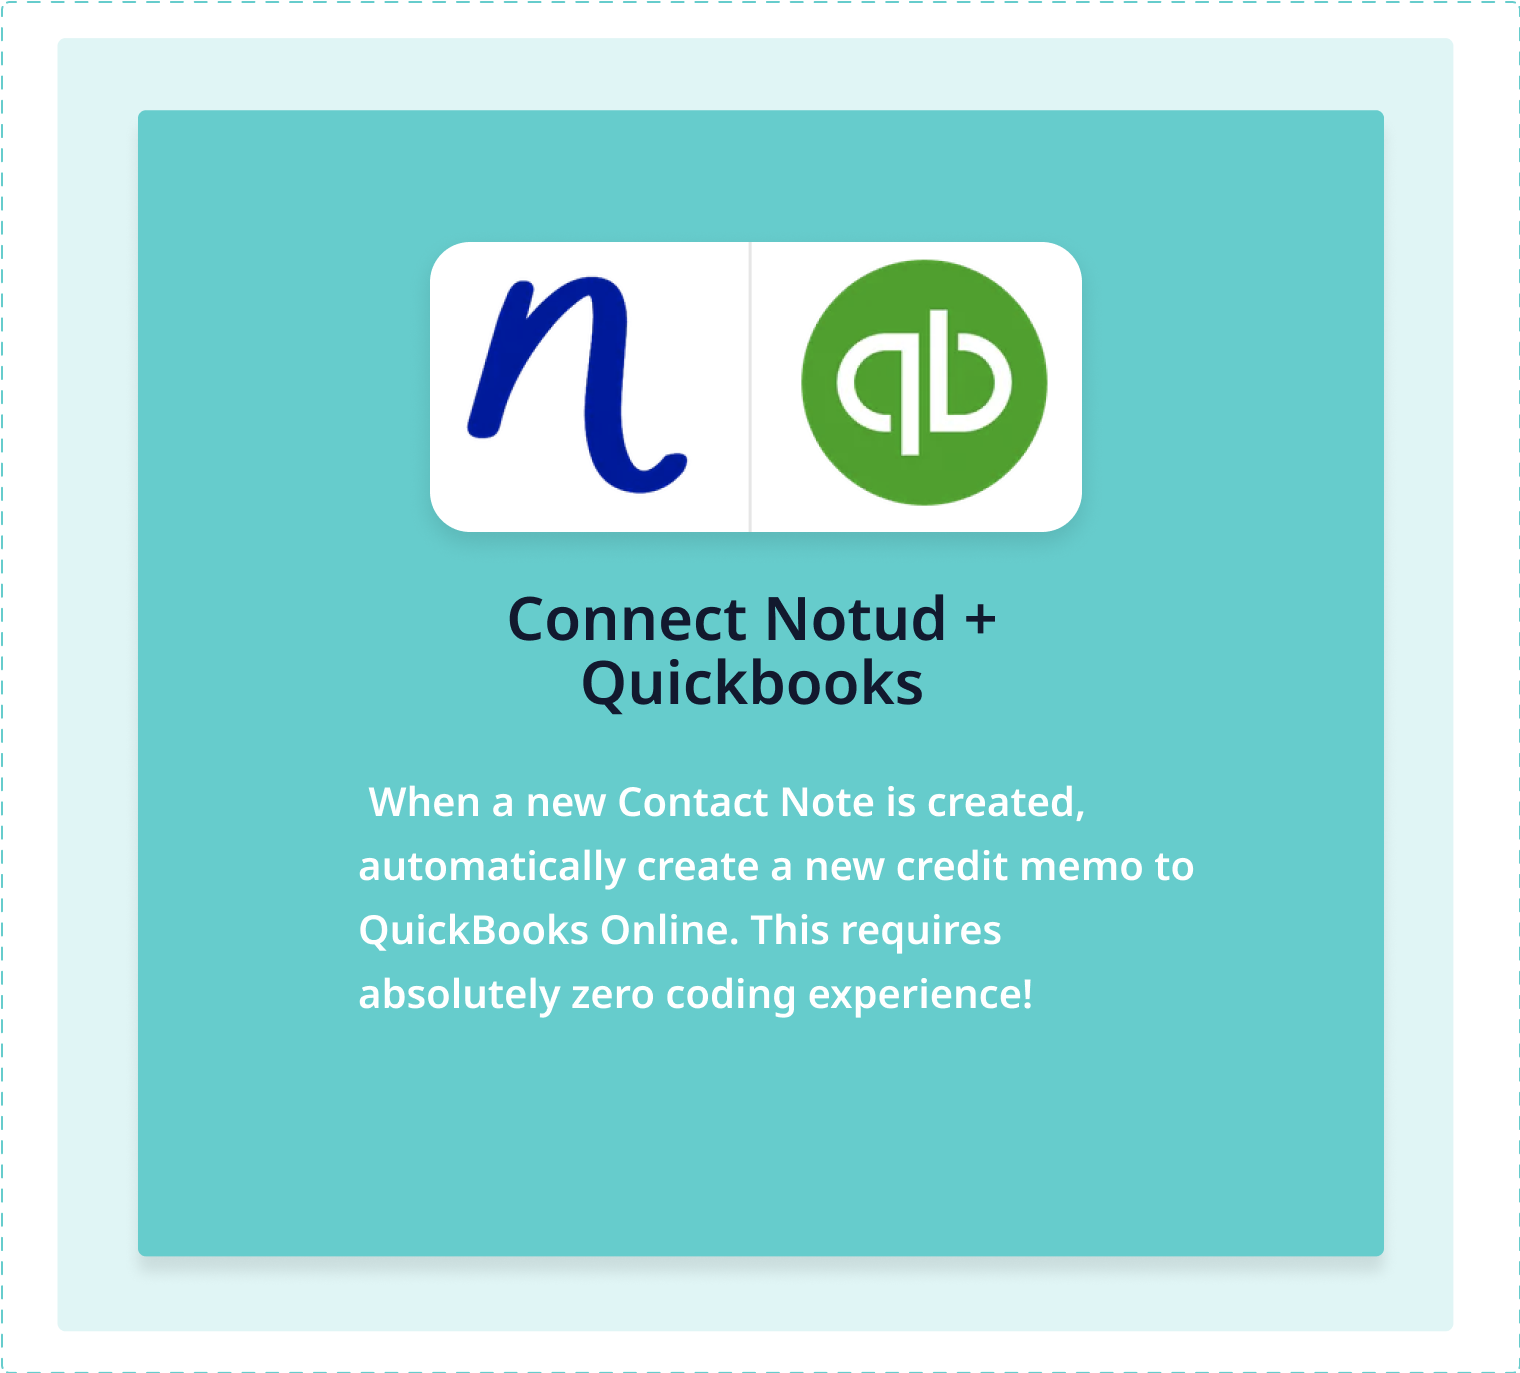 Connect Notud to Quickbooks